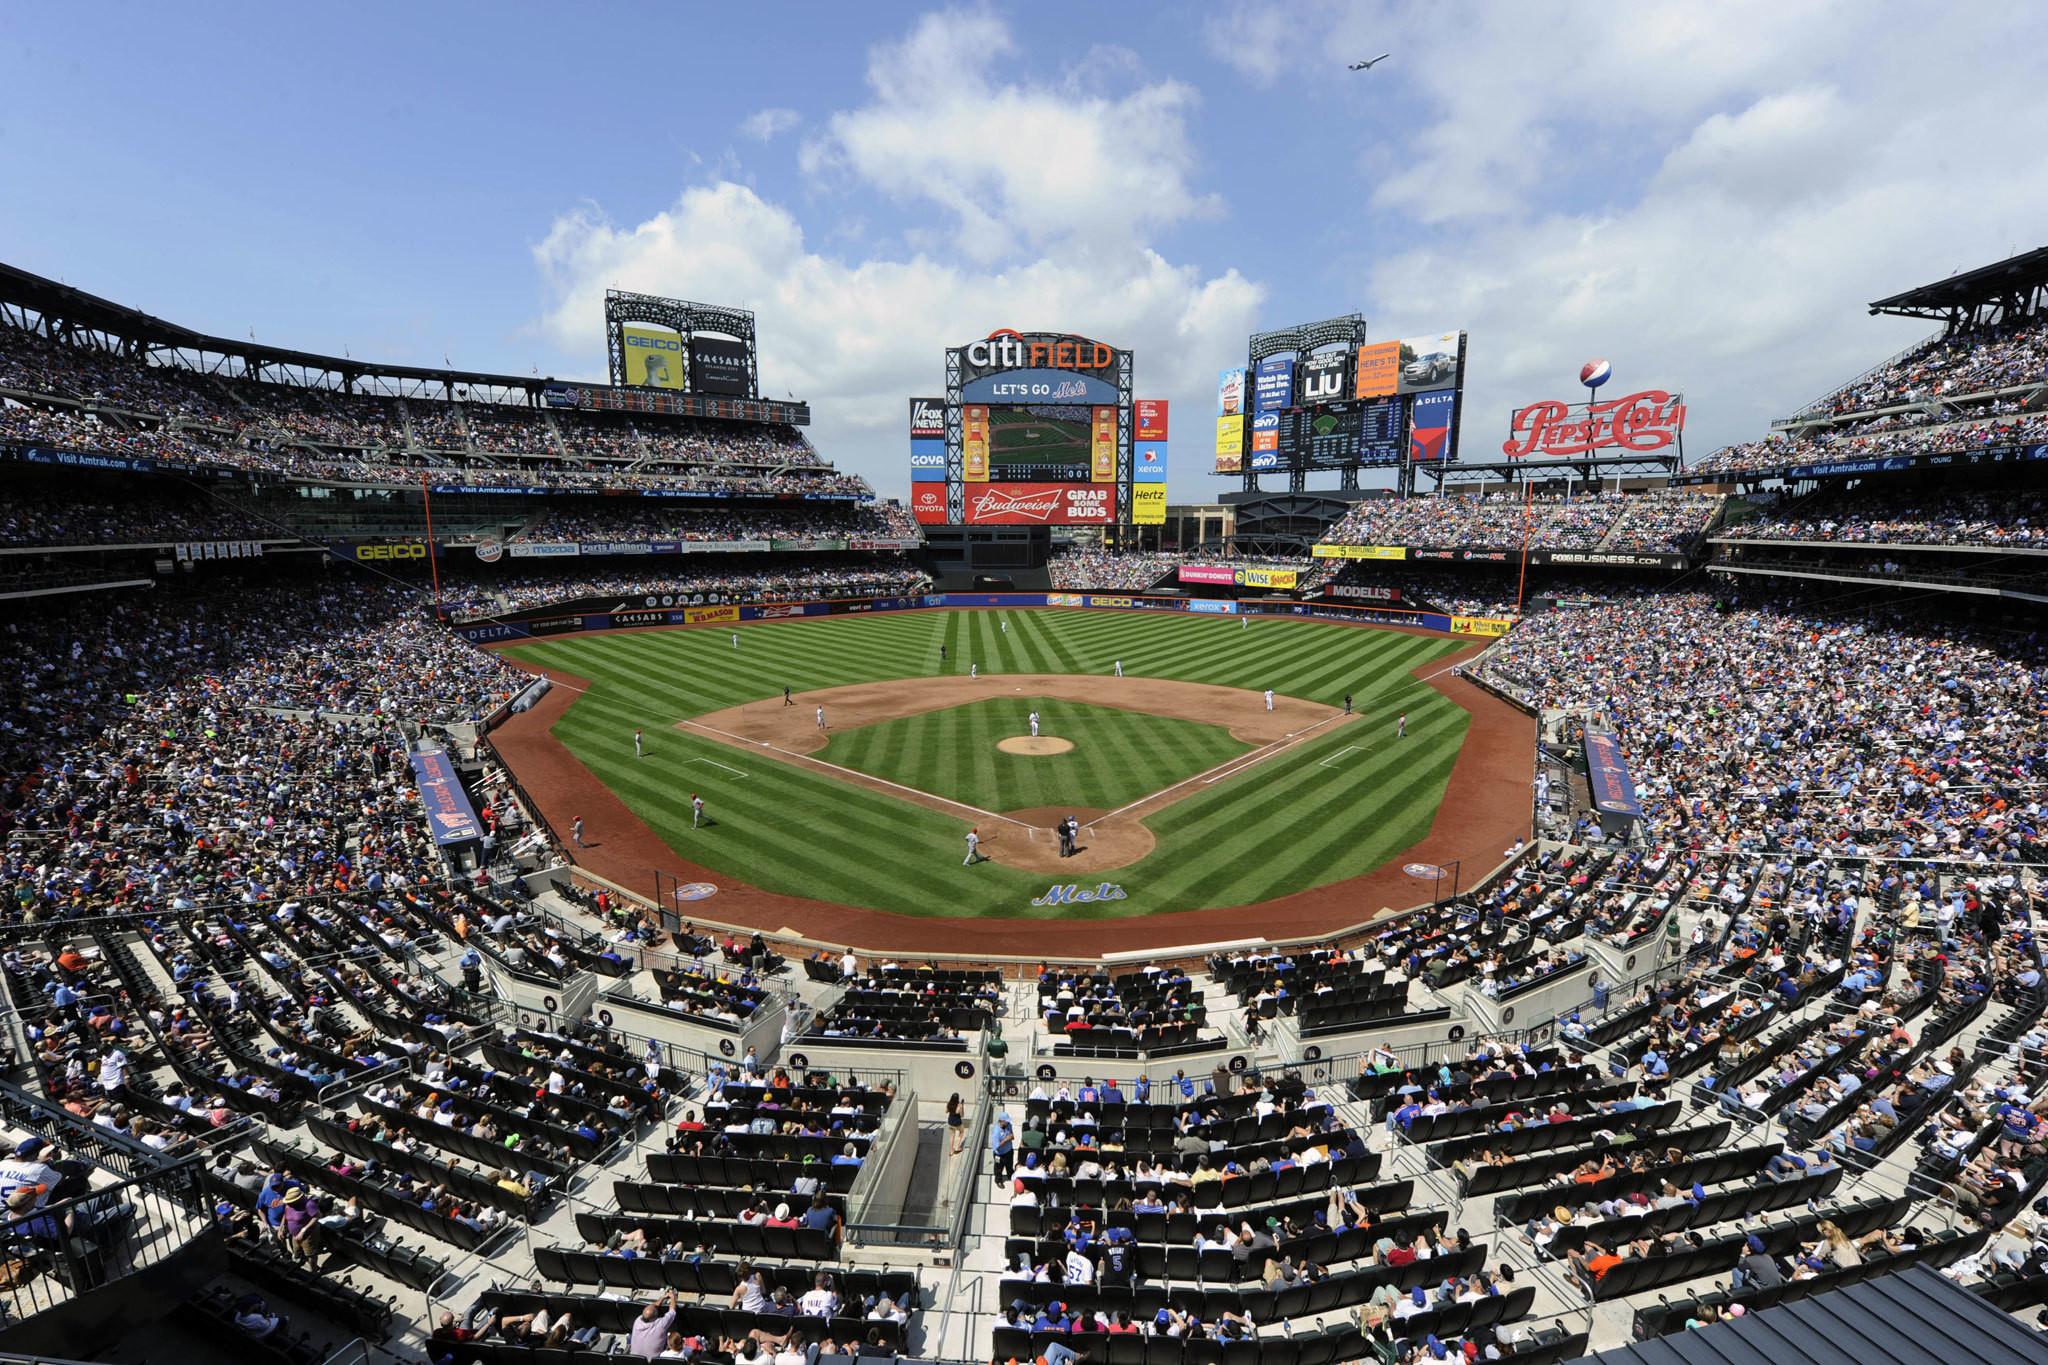 New york yankees stadium wallpaper 52 images citi field download 1950x1267 altavistaventures Images